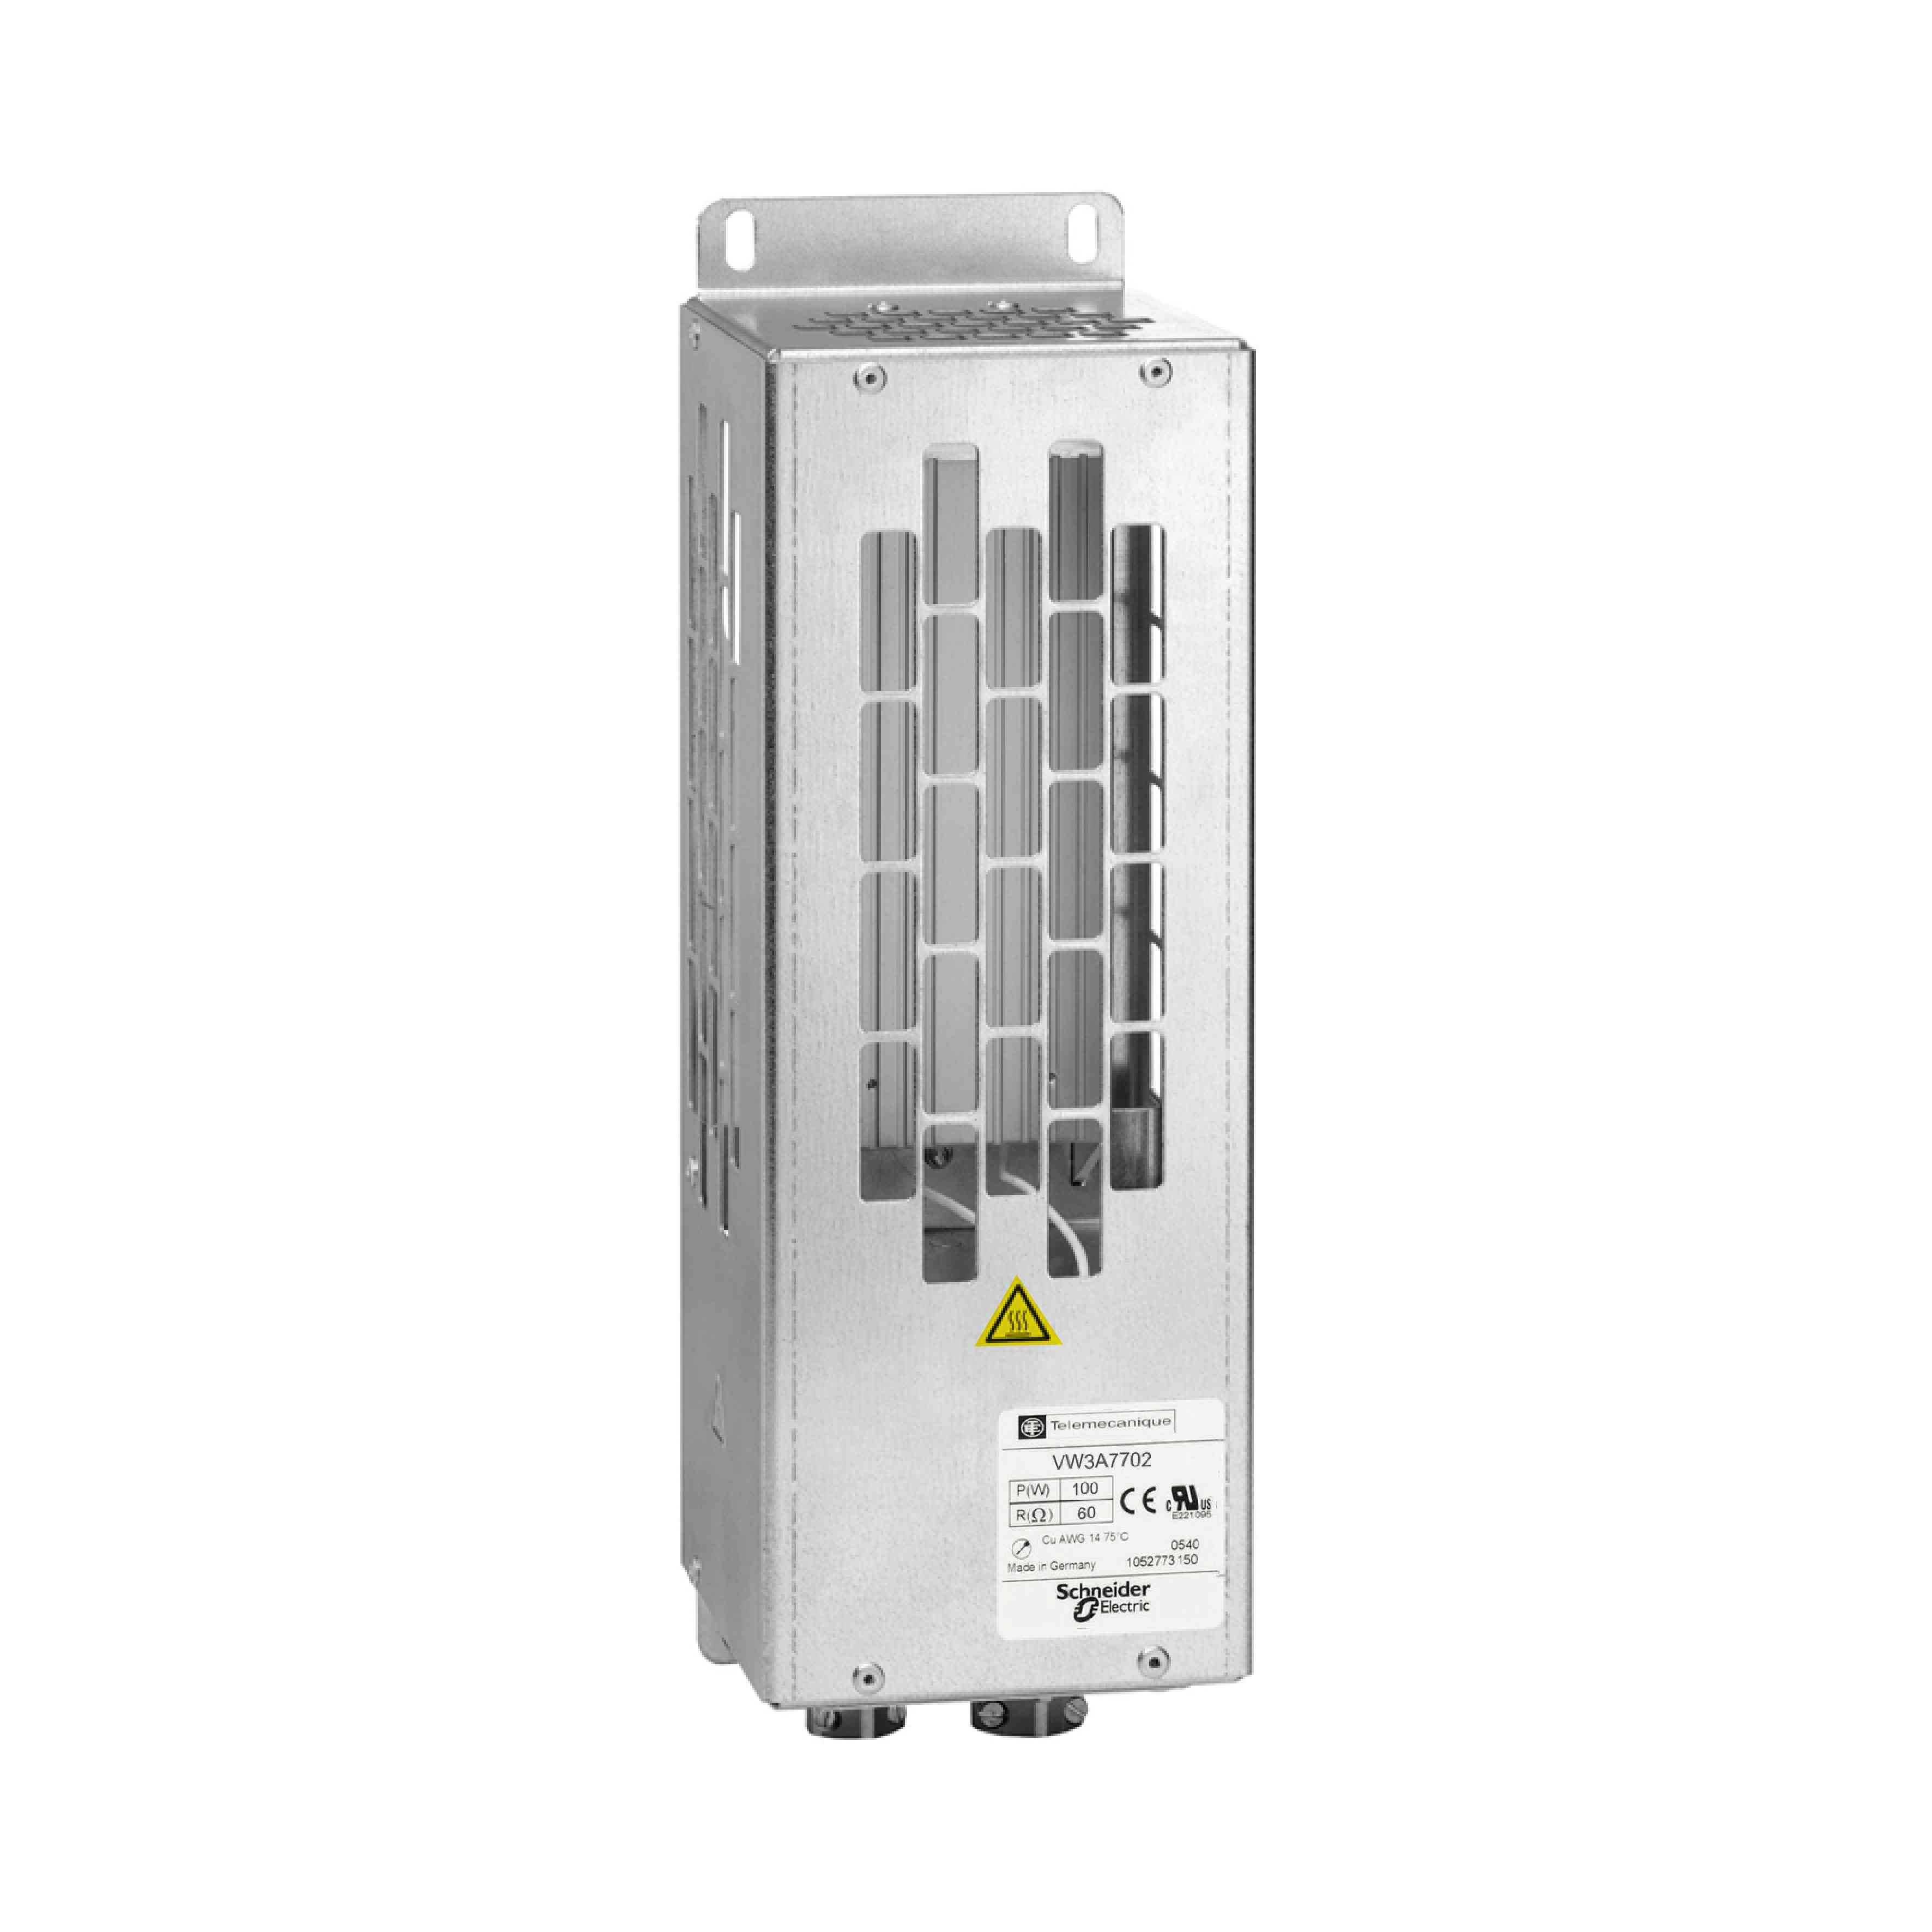 Zaviralni upornik - IP 20 - 100 Ohmov - 1,6 kW